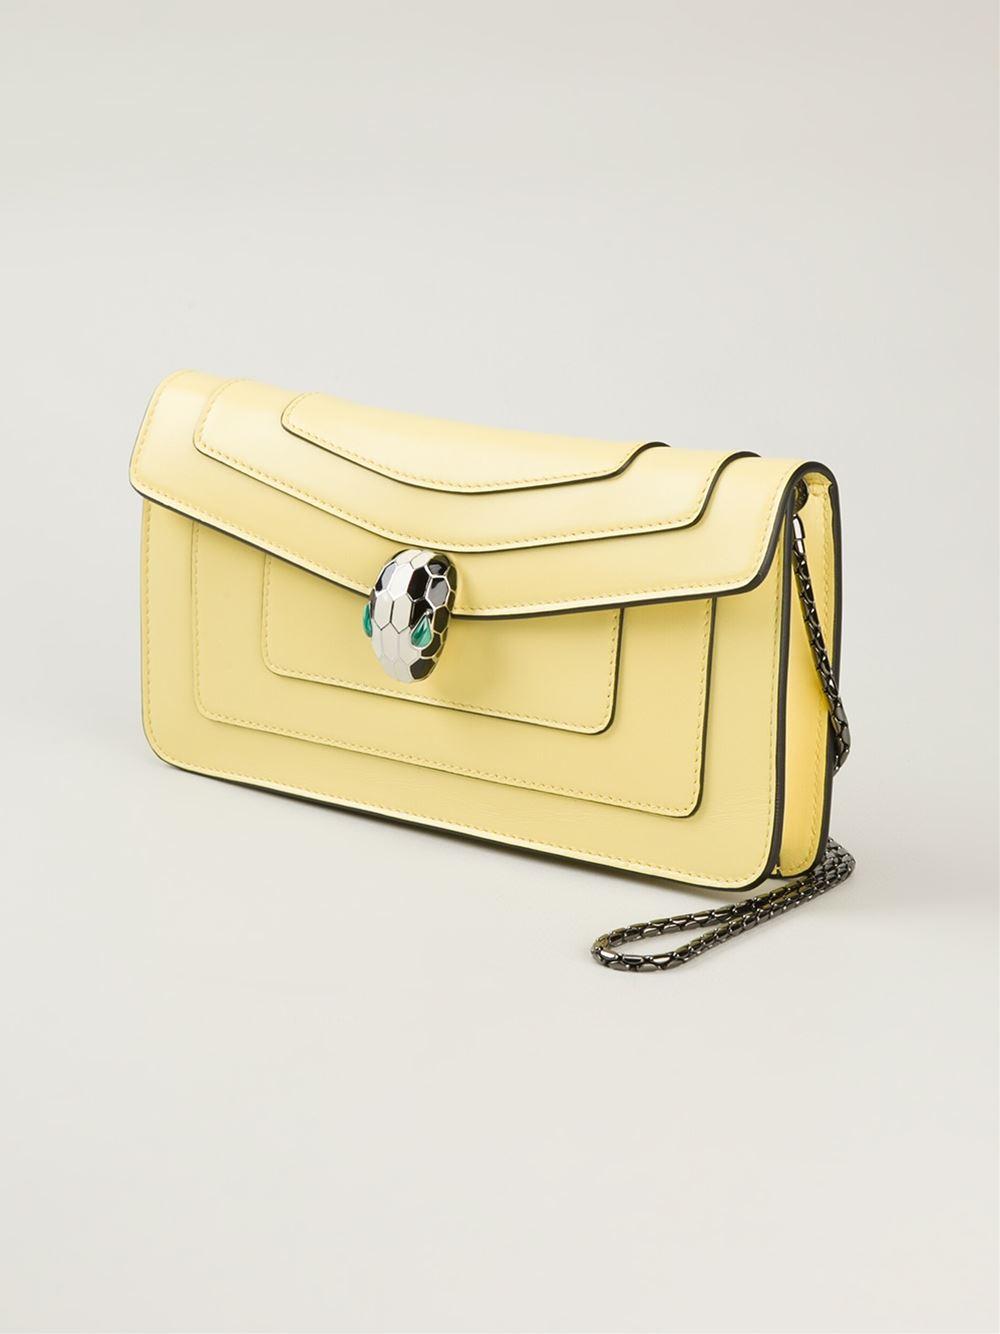 c88d2b4b6d27 BVLGARI Serpenti Forever Calf-Leather Shoulder Bag in Yellow - Lyst